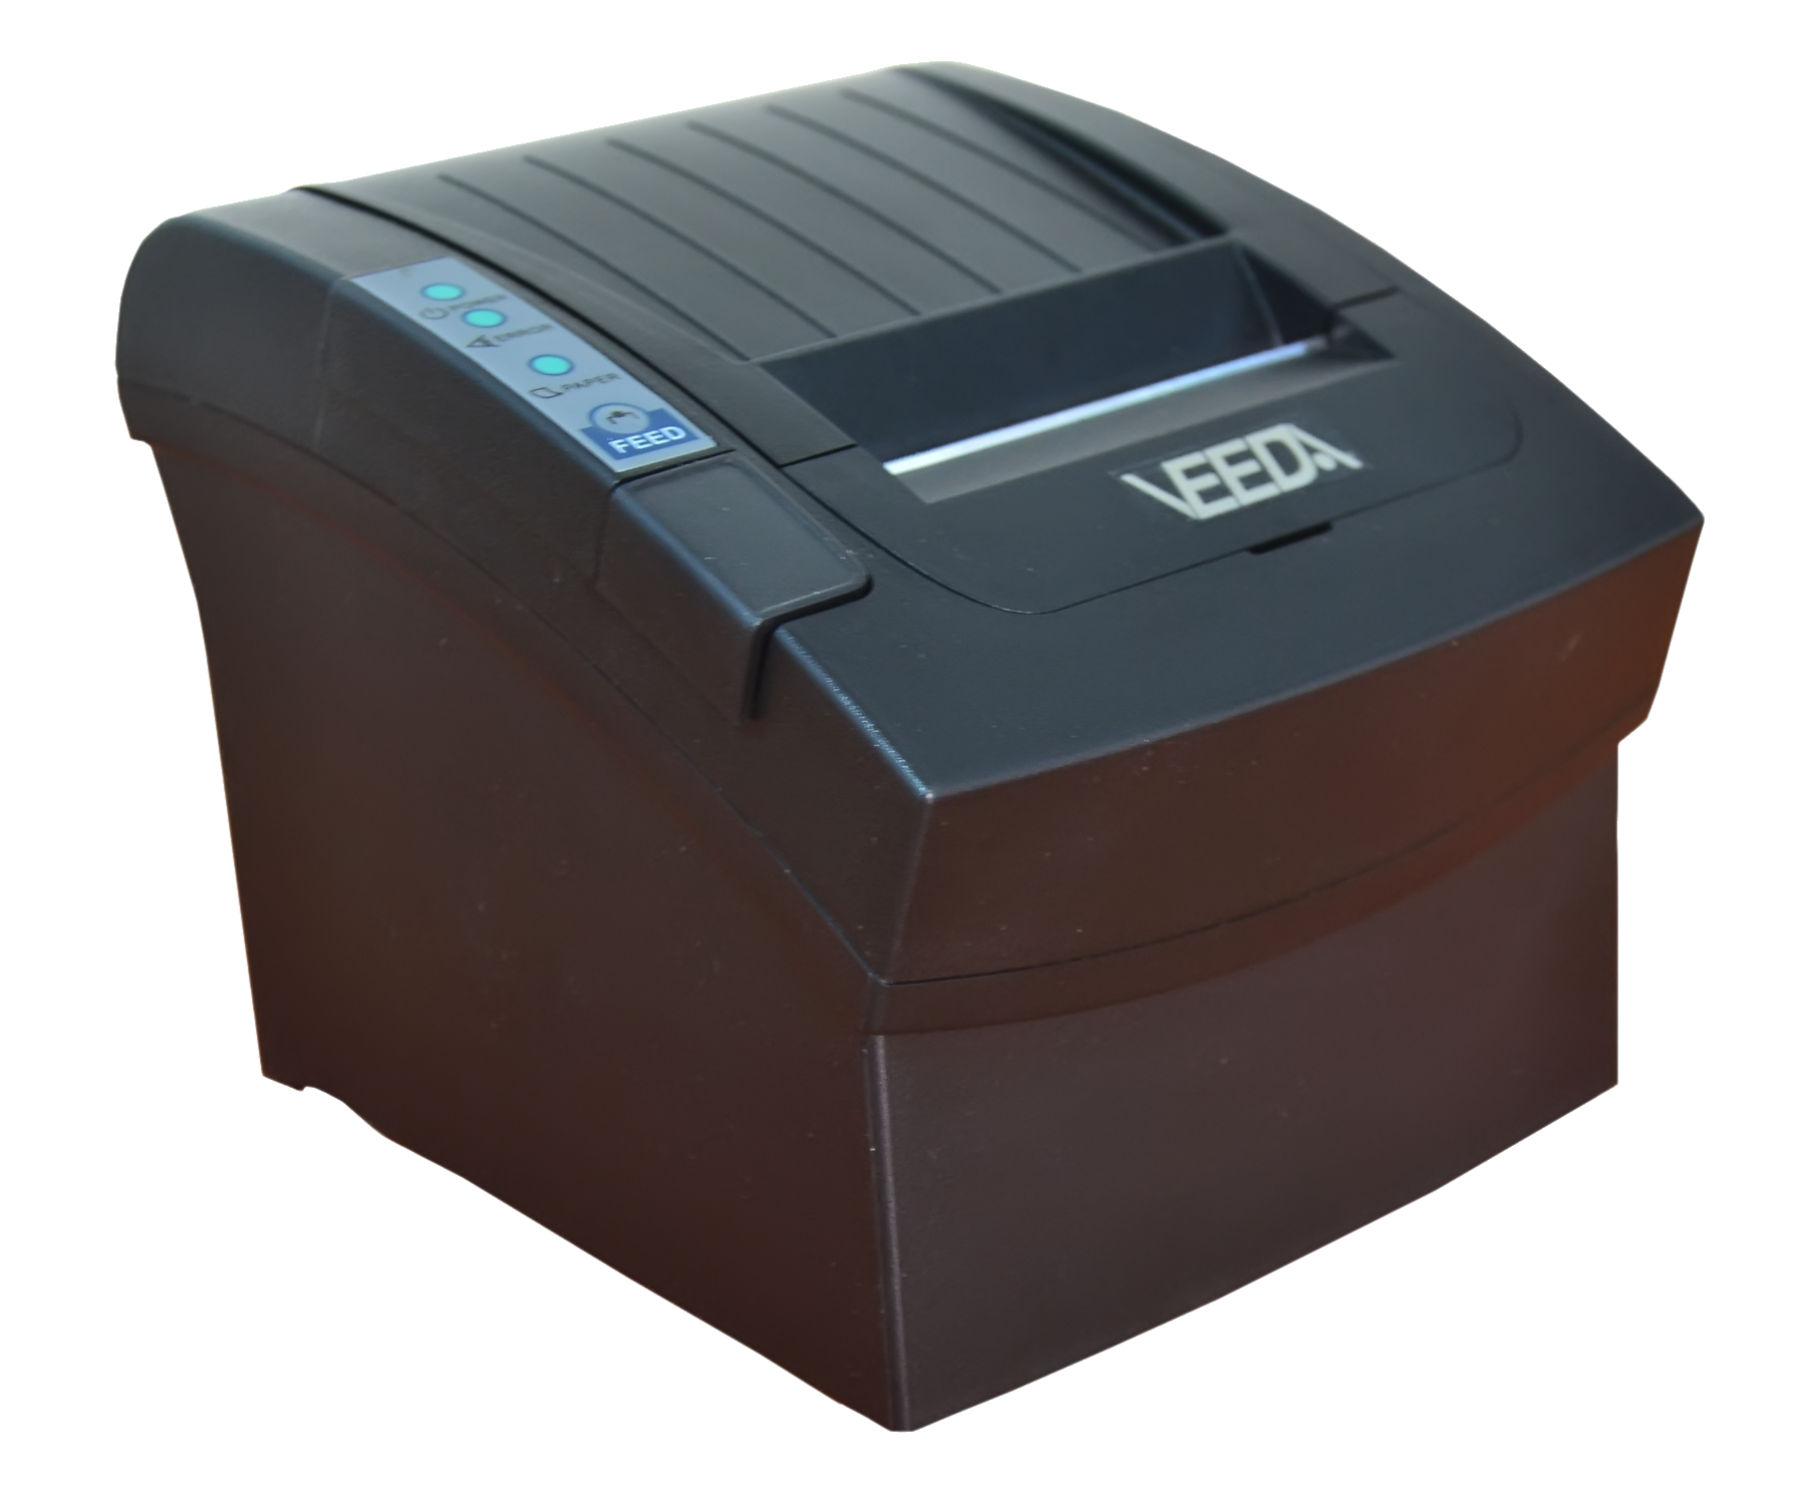 Thermal Receipt Printer R7